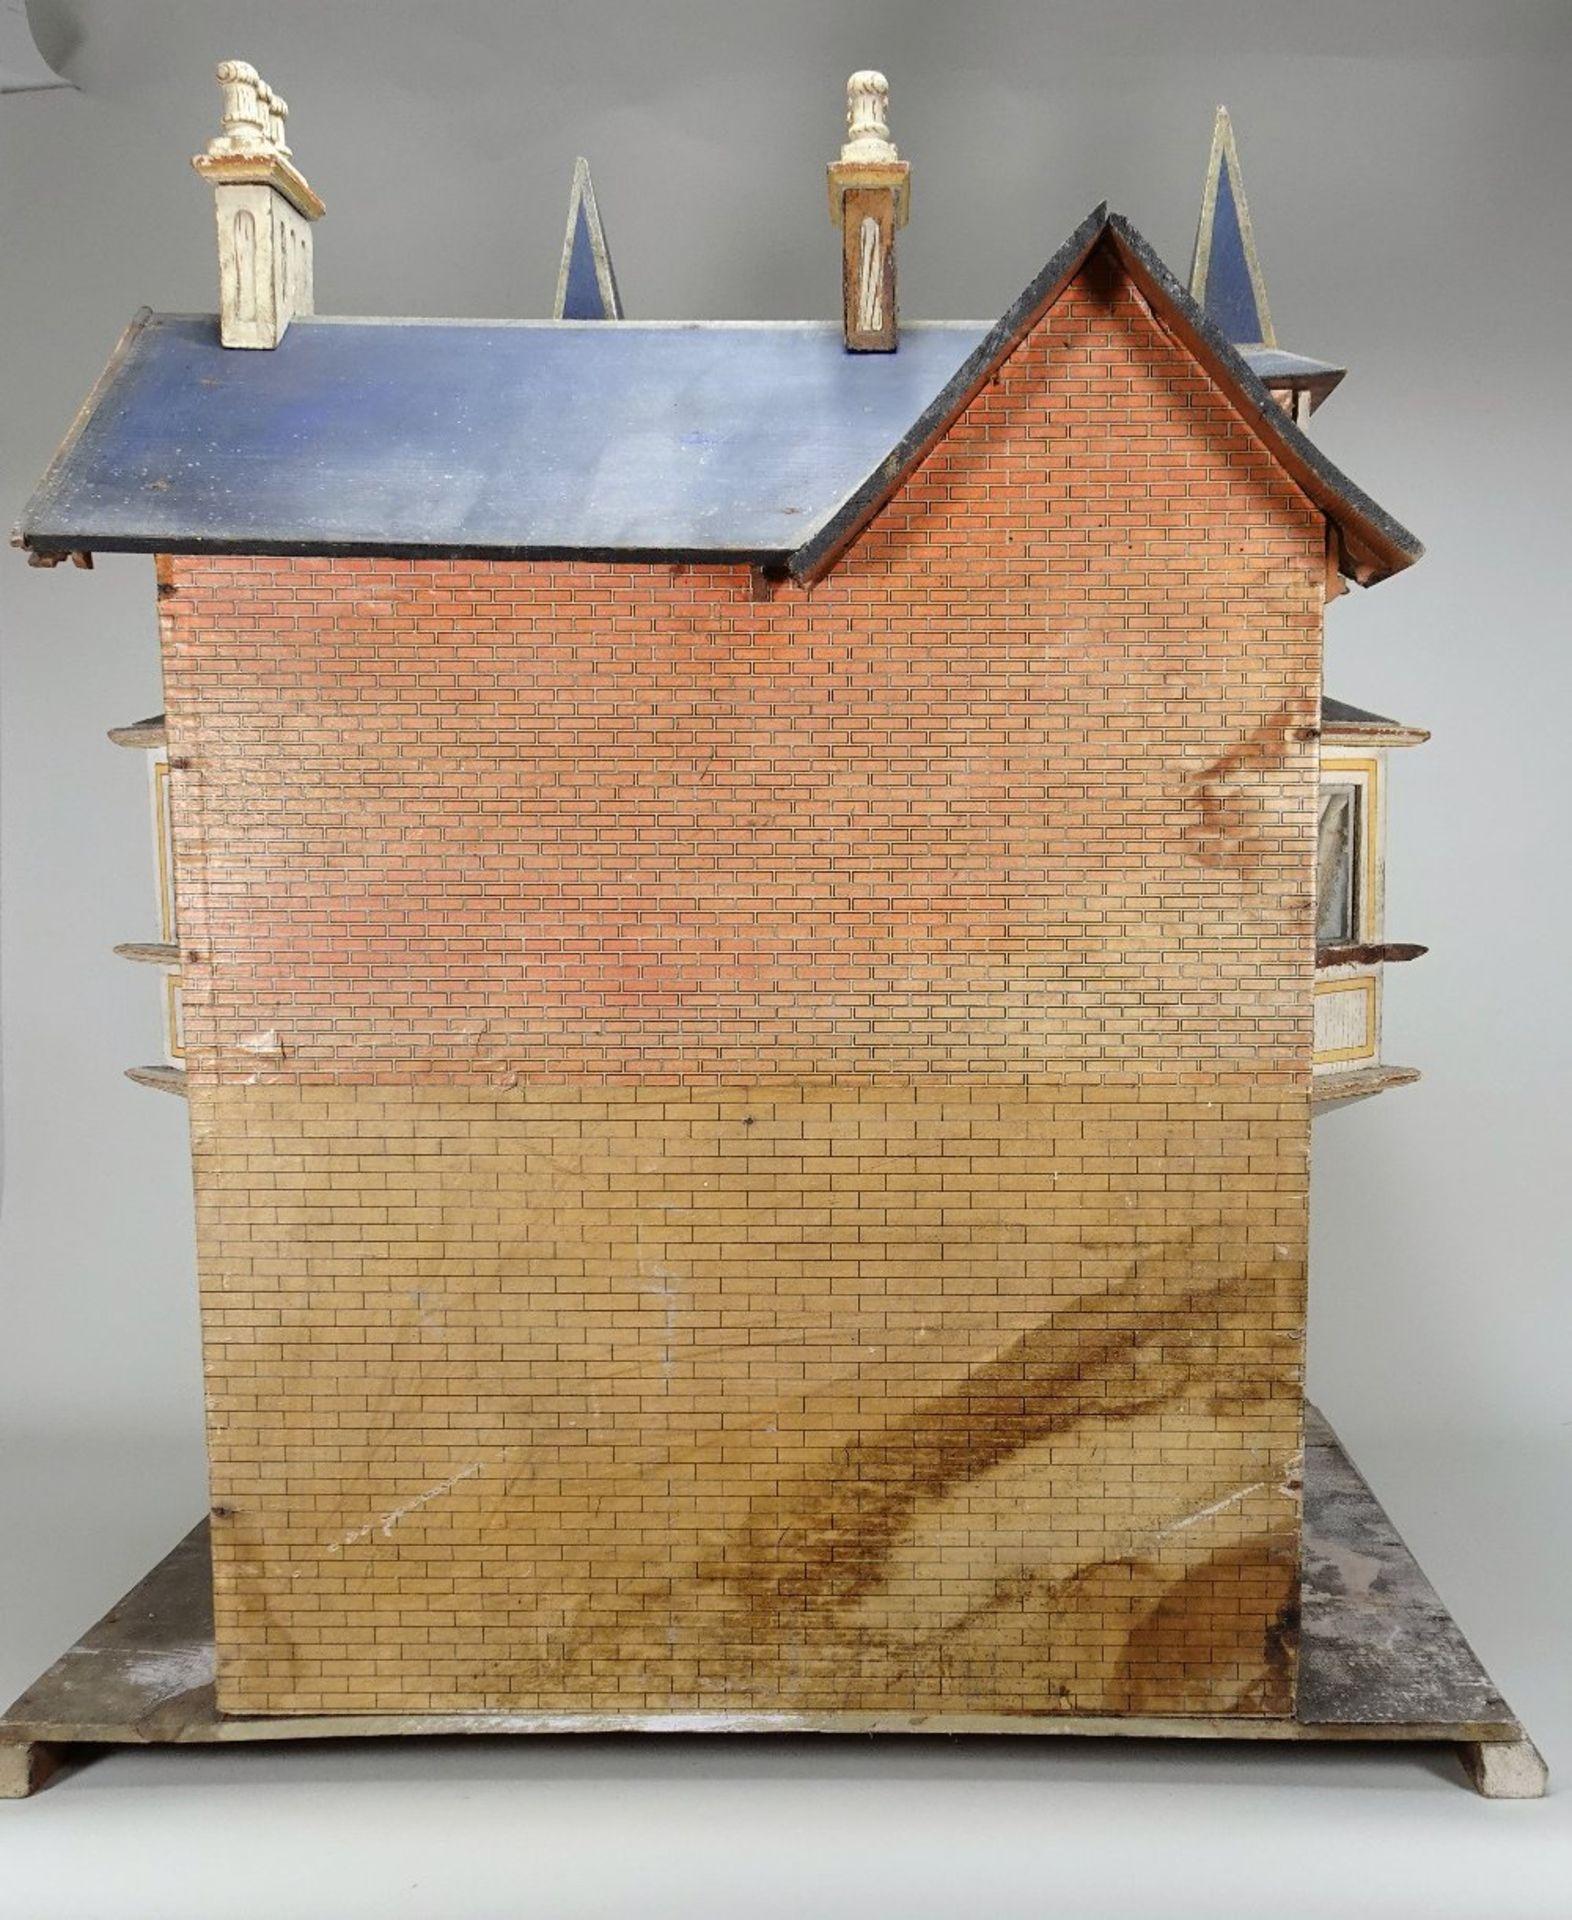 A large and impressive Moritz Gottschalk blue roof dolls house model: 2556/2 in original condition, - Image 11 of 13